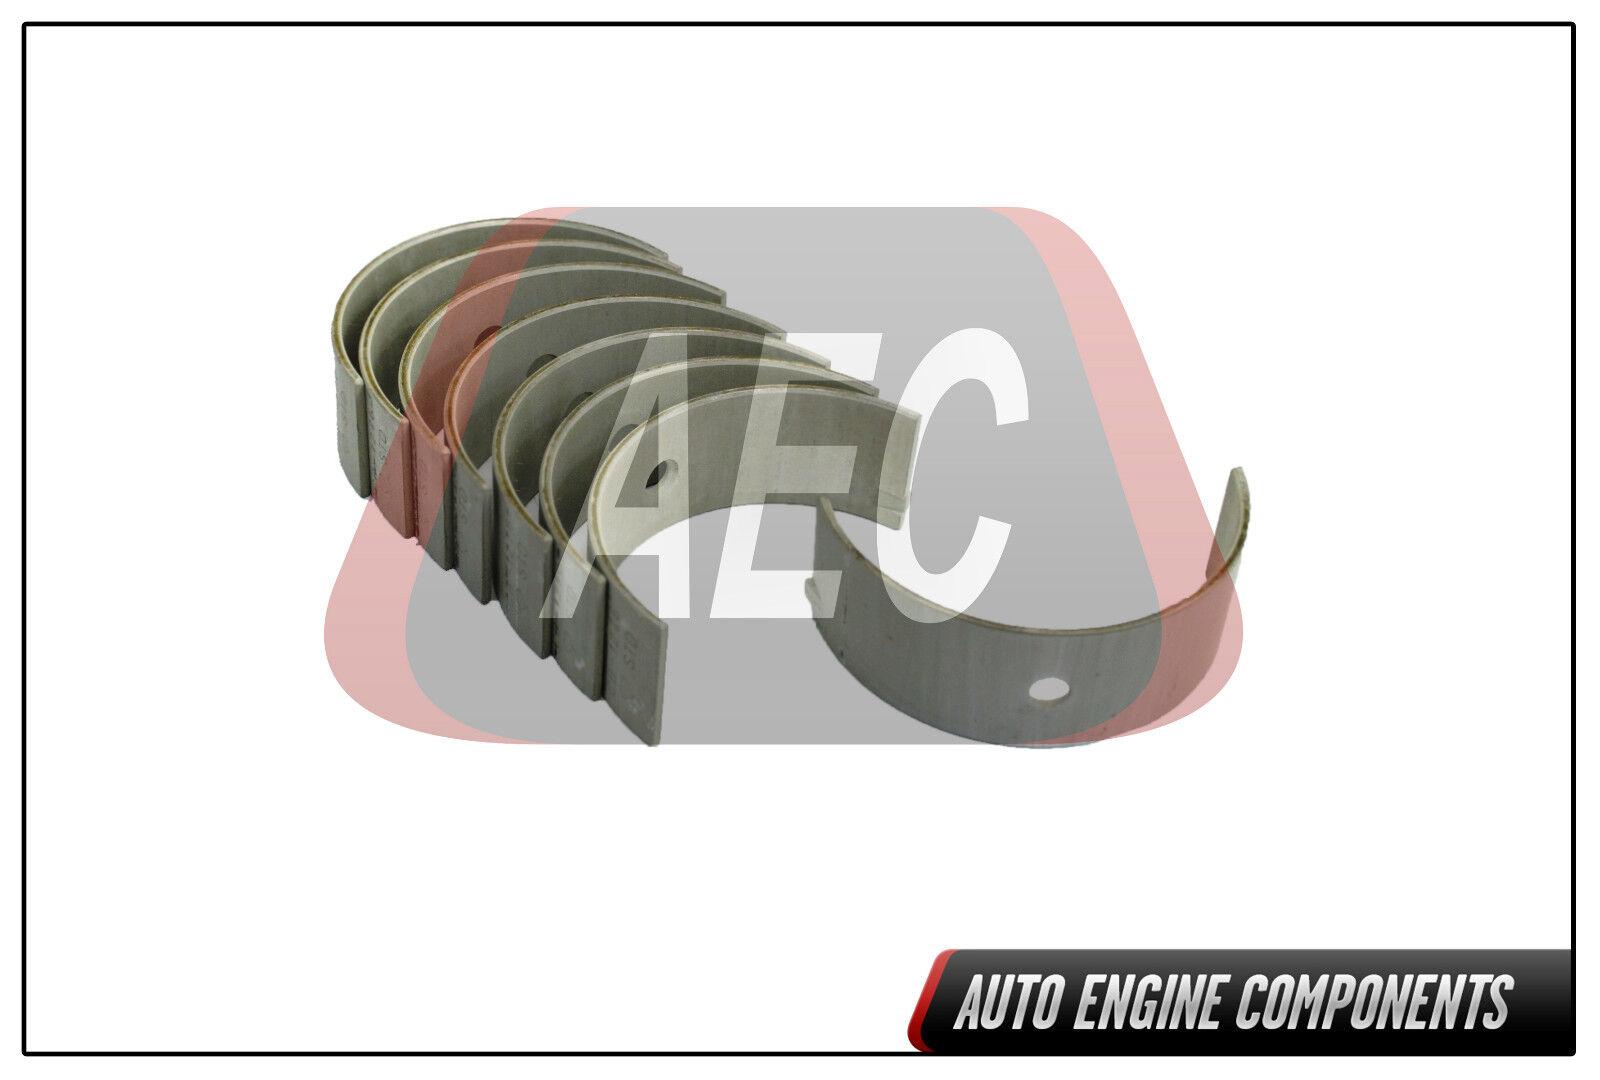 Rod Bearing Set Fits Ford Mazda Kia Capri Sephia Miata 1.6 1.8 L DOHC SIZE STD